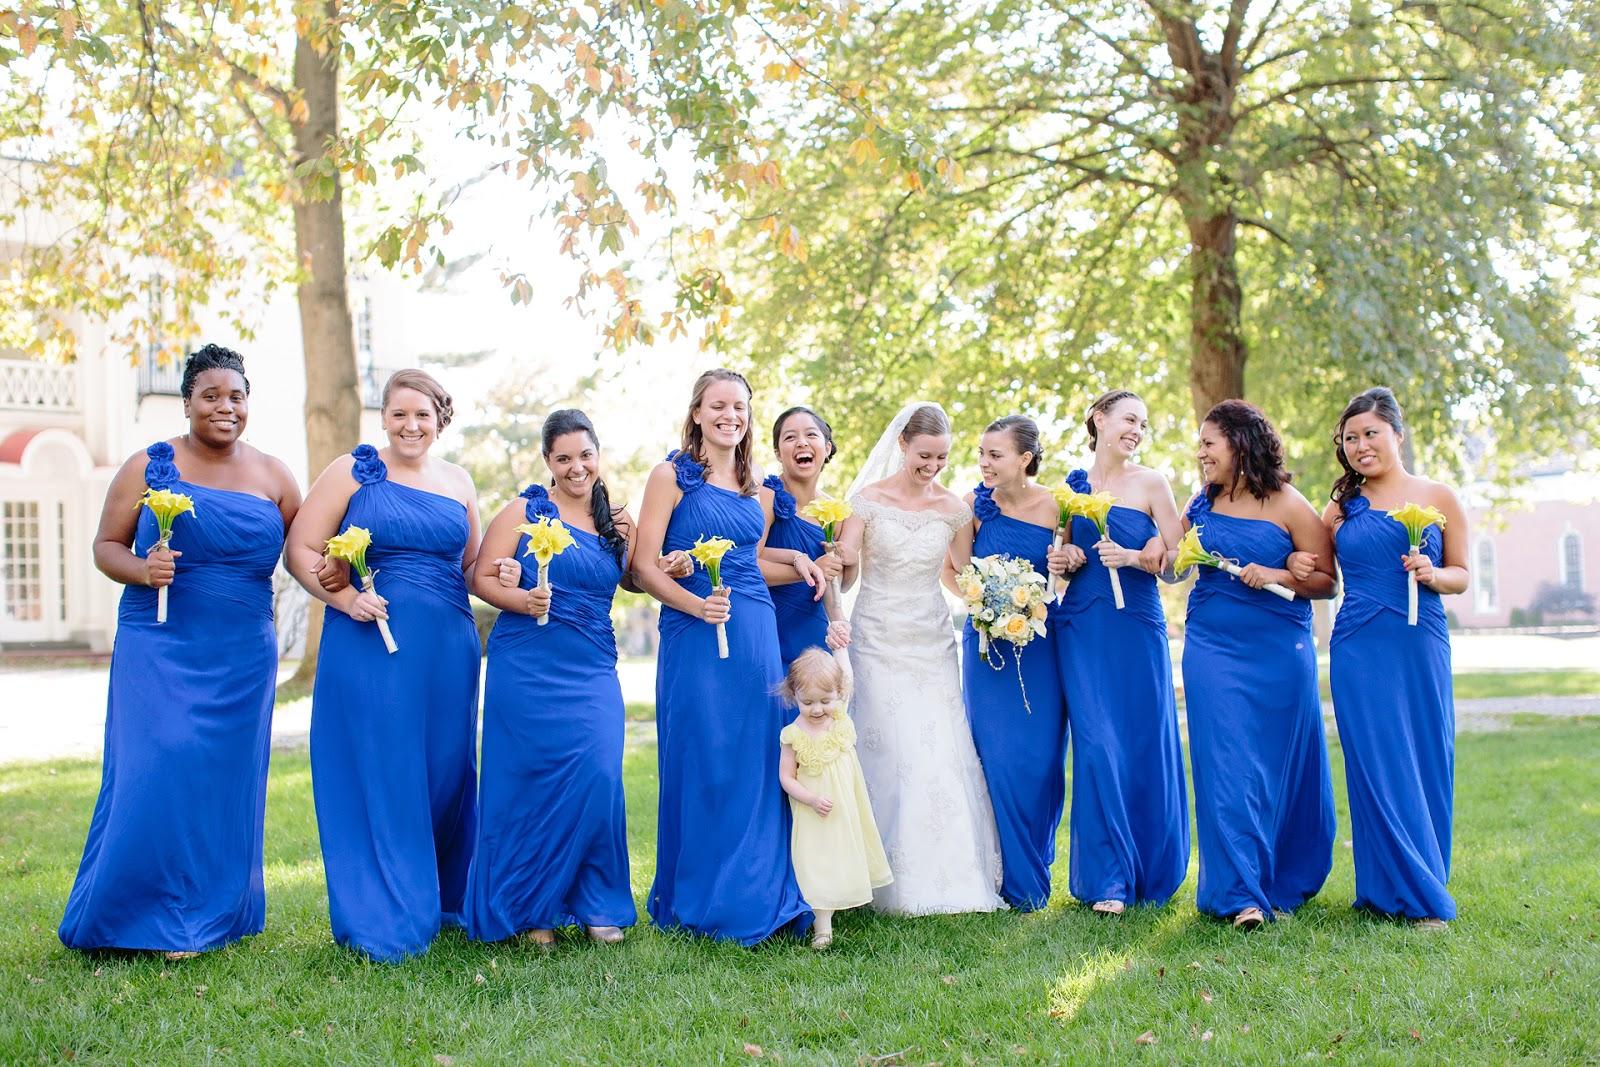 Selecting Bridesmaids Part 1